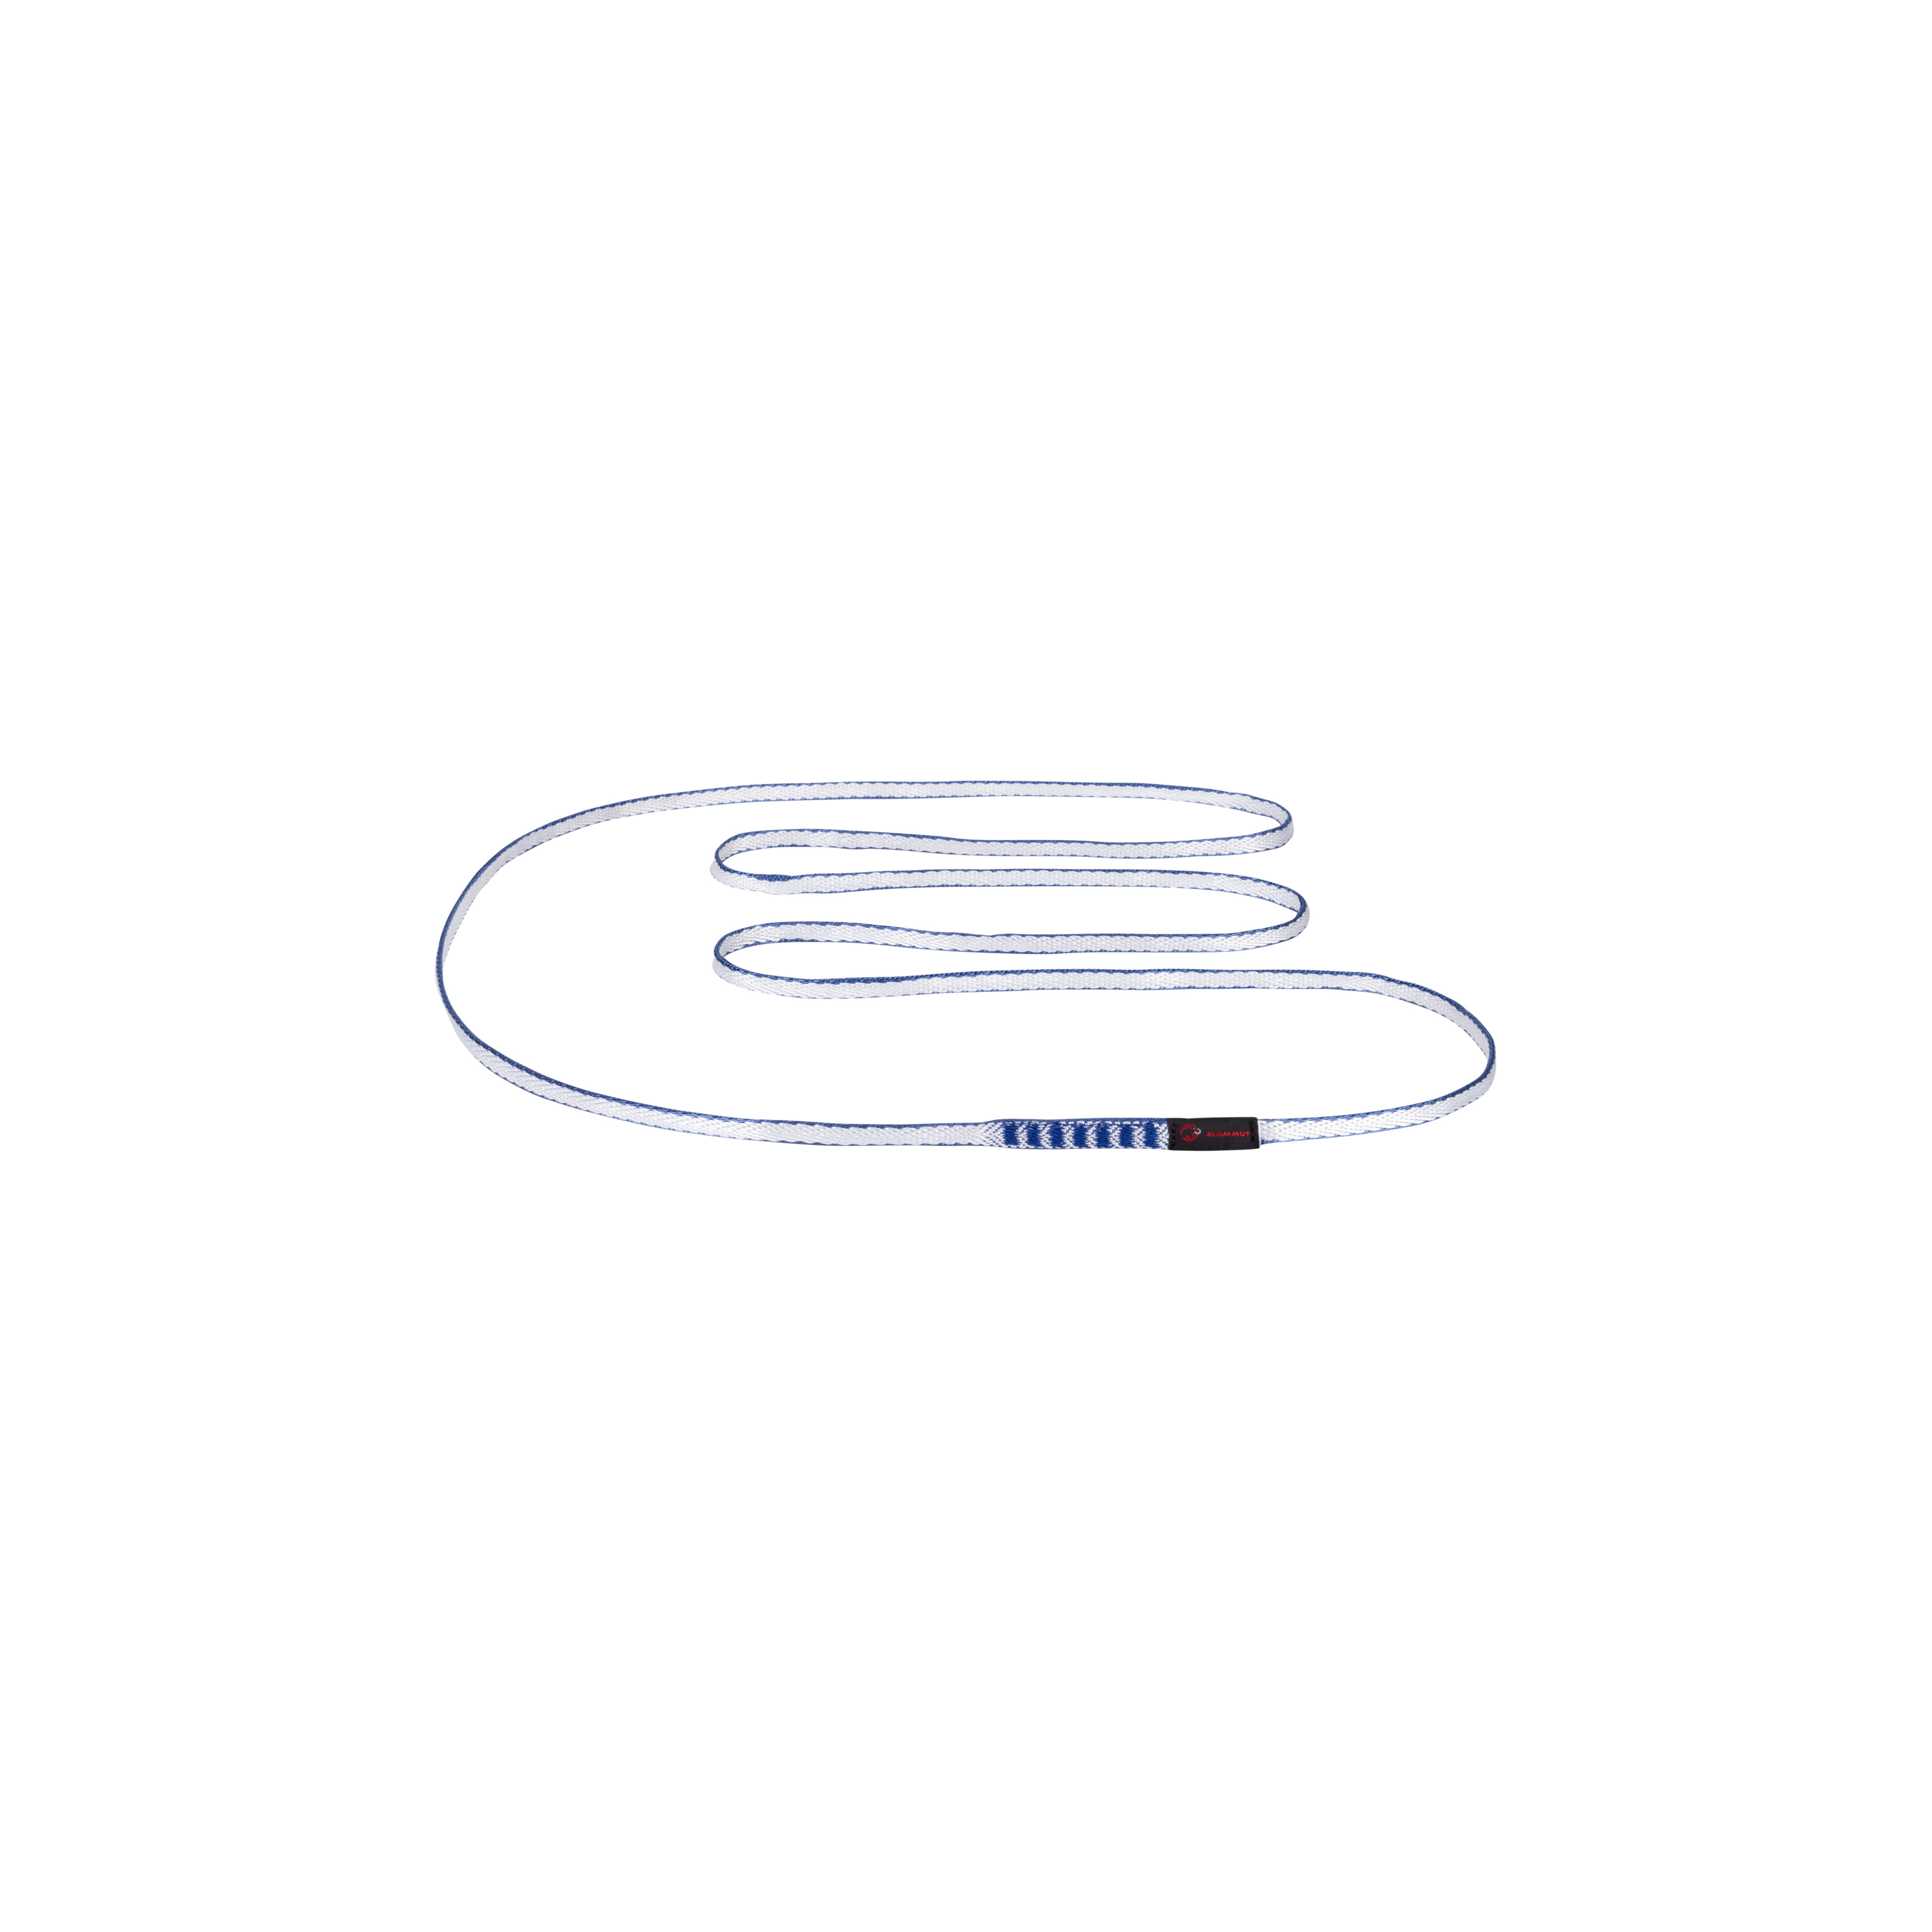 Contact Sling 8.0 - 120 cm, blue thumbnail